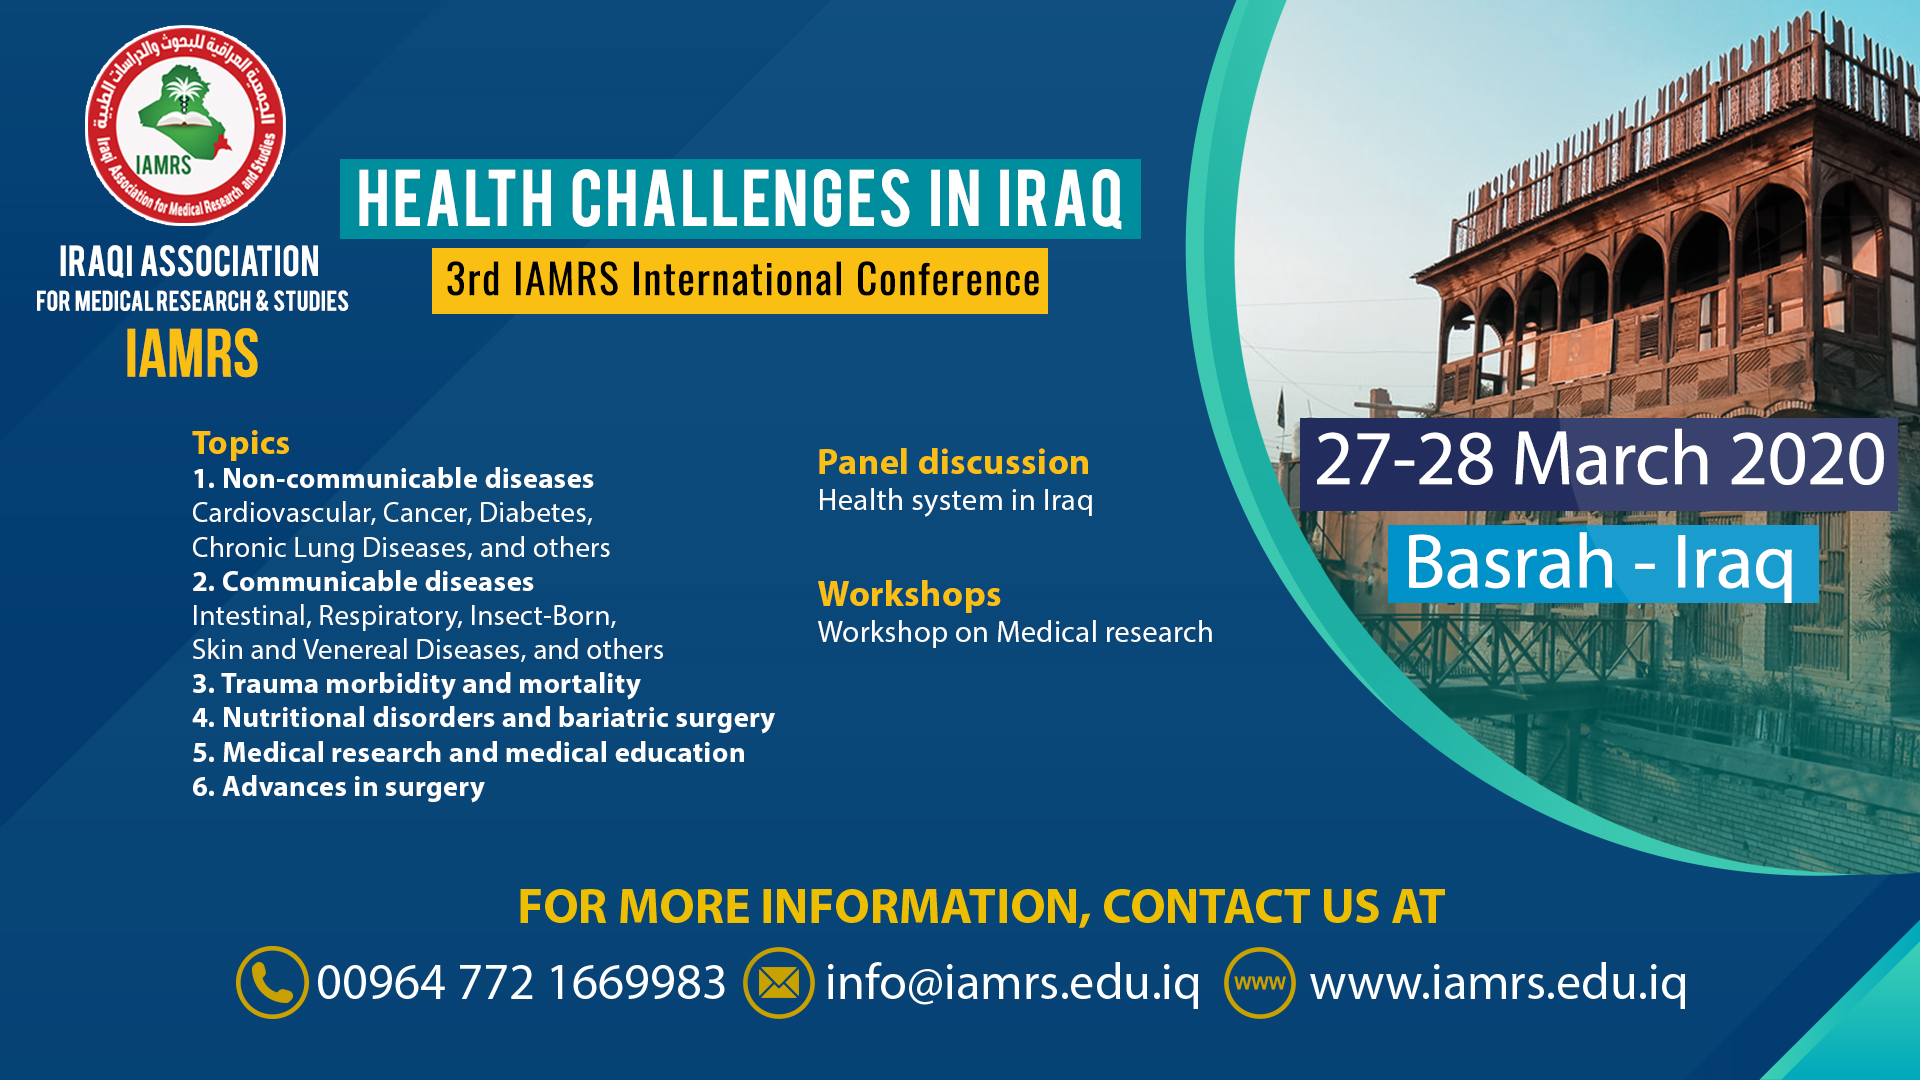 3rd IAMRS International Conference Scientific Program